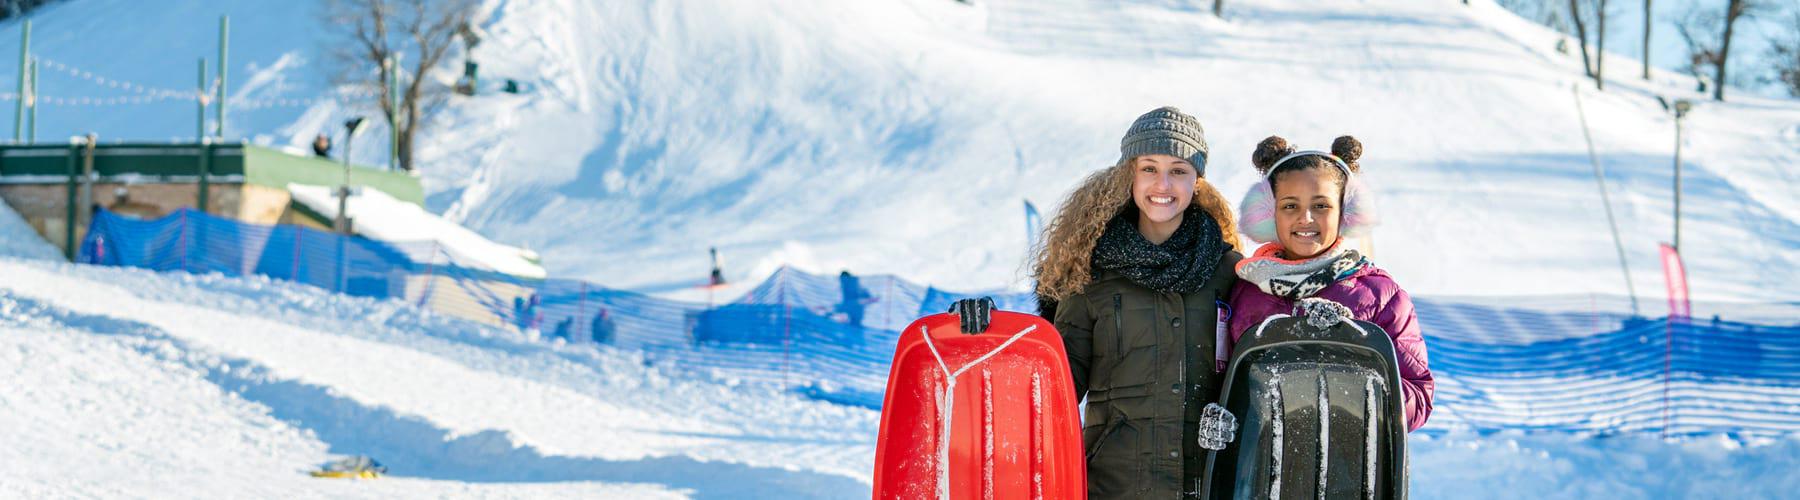 Two girls sledding